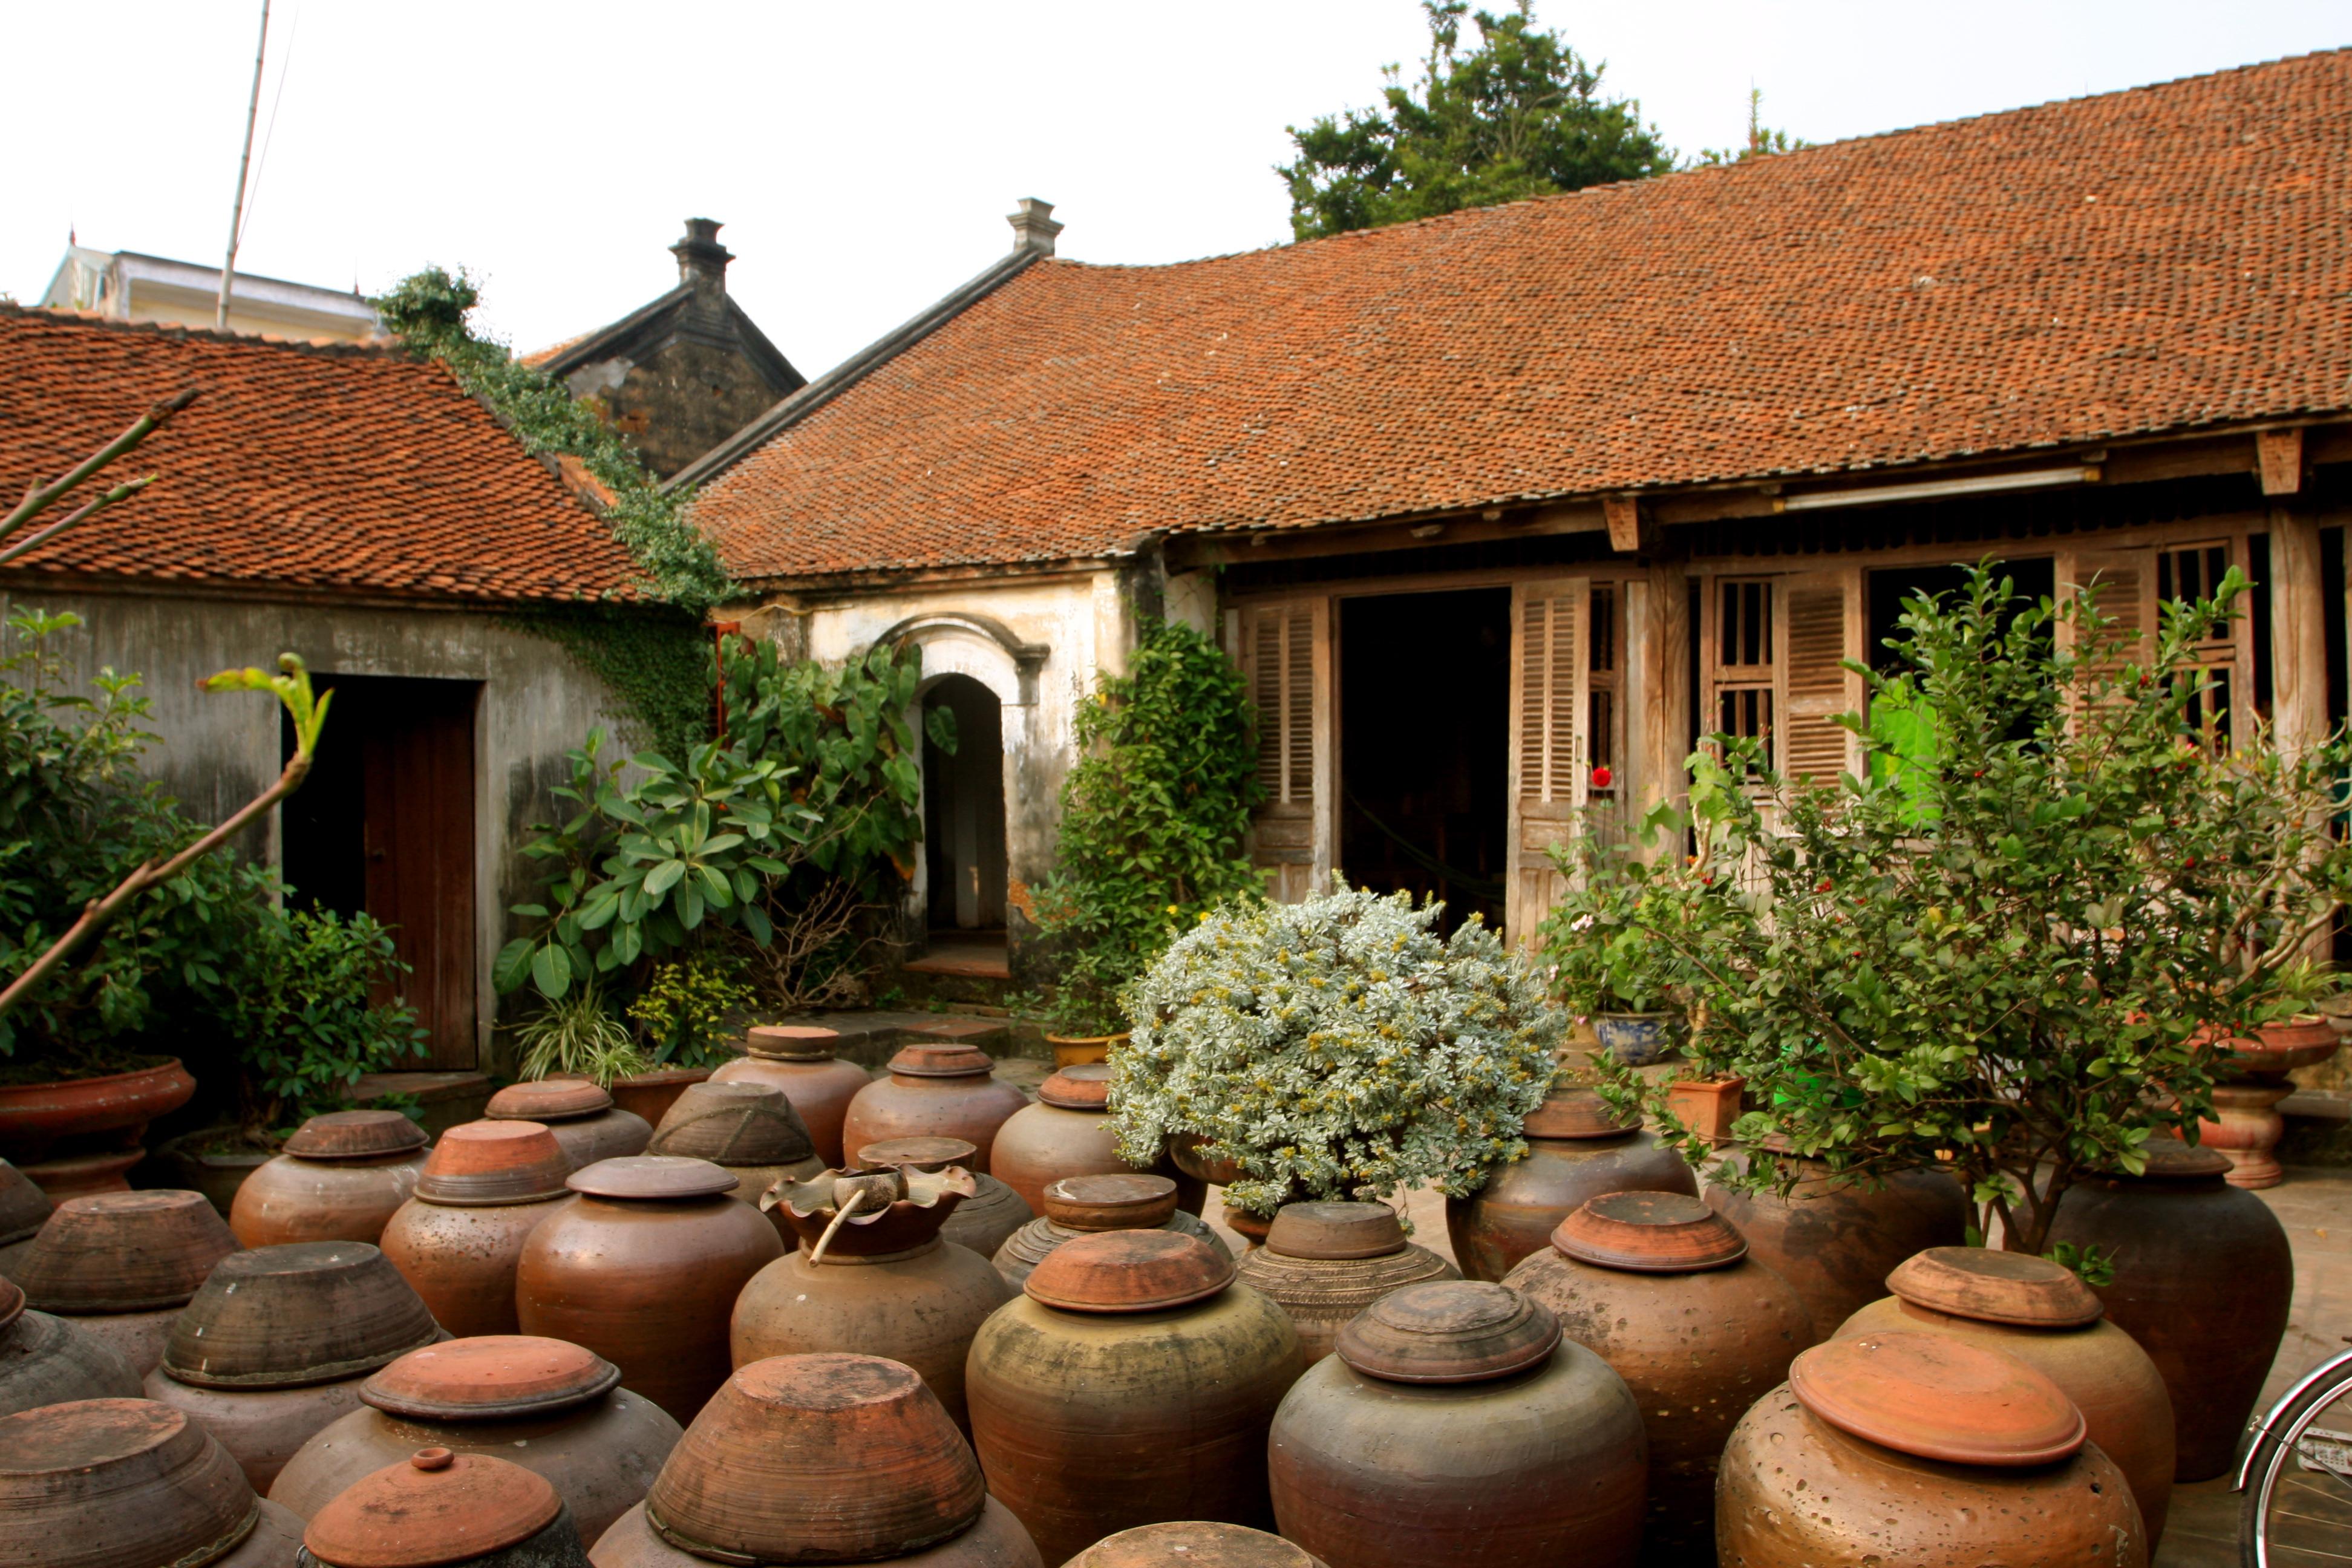 duong-lam-ancient-village-3